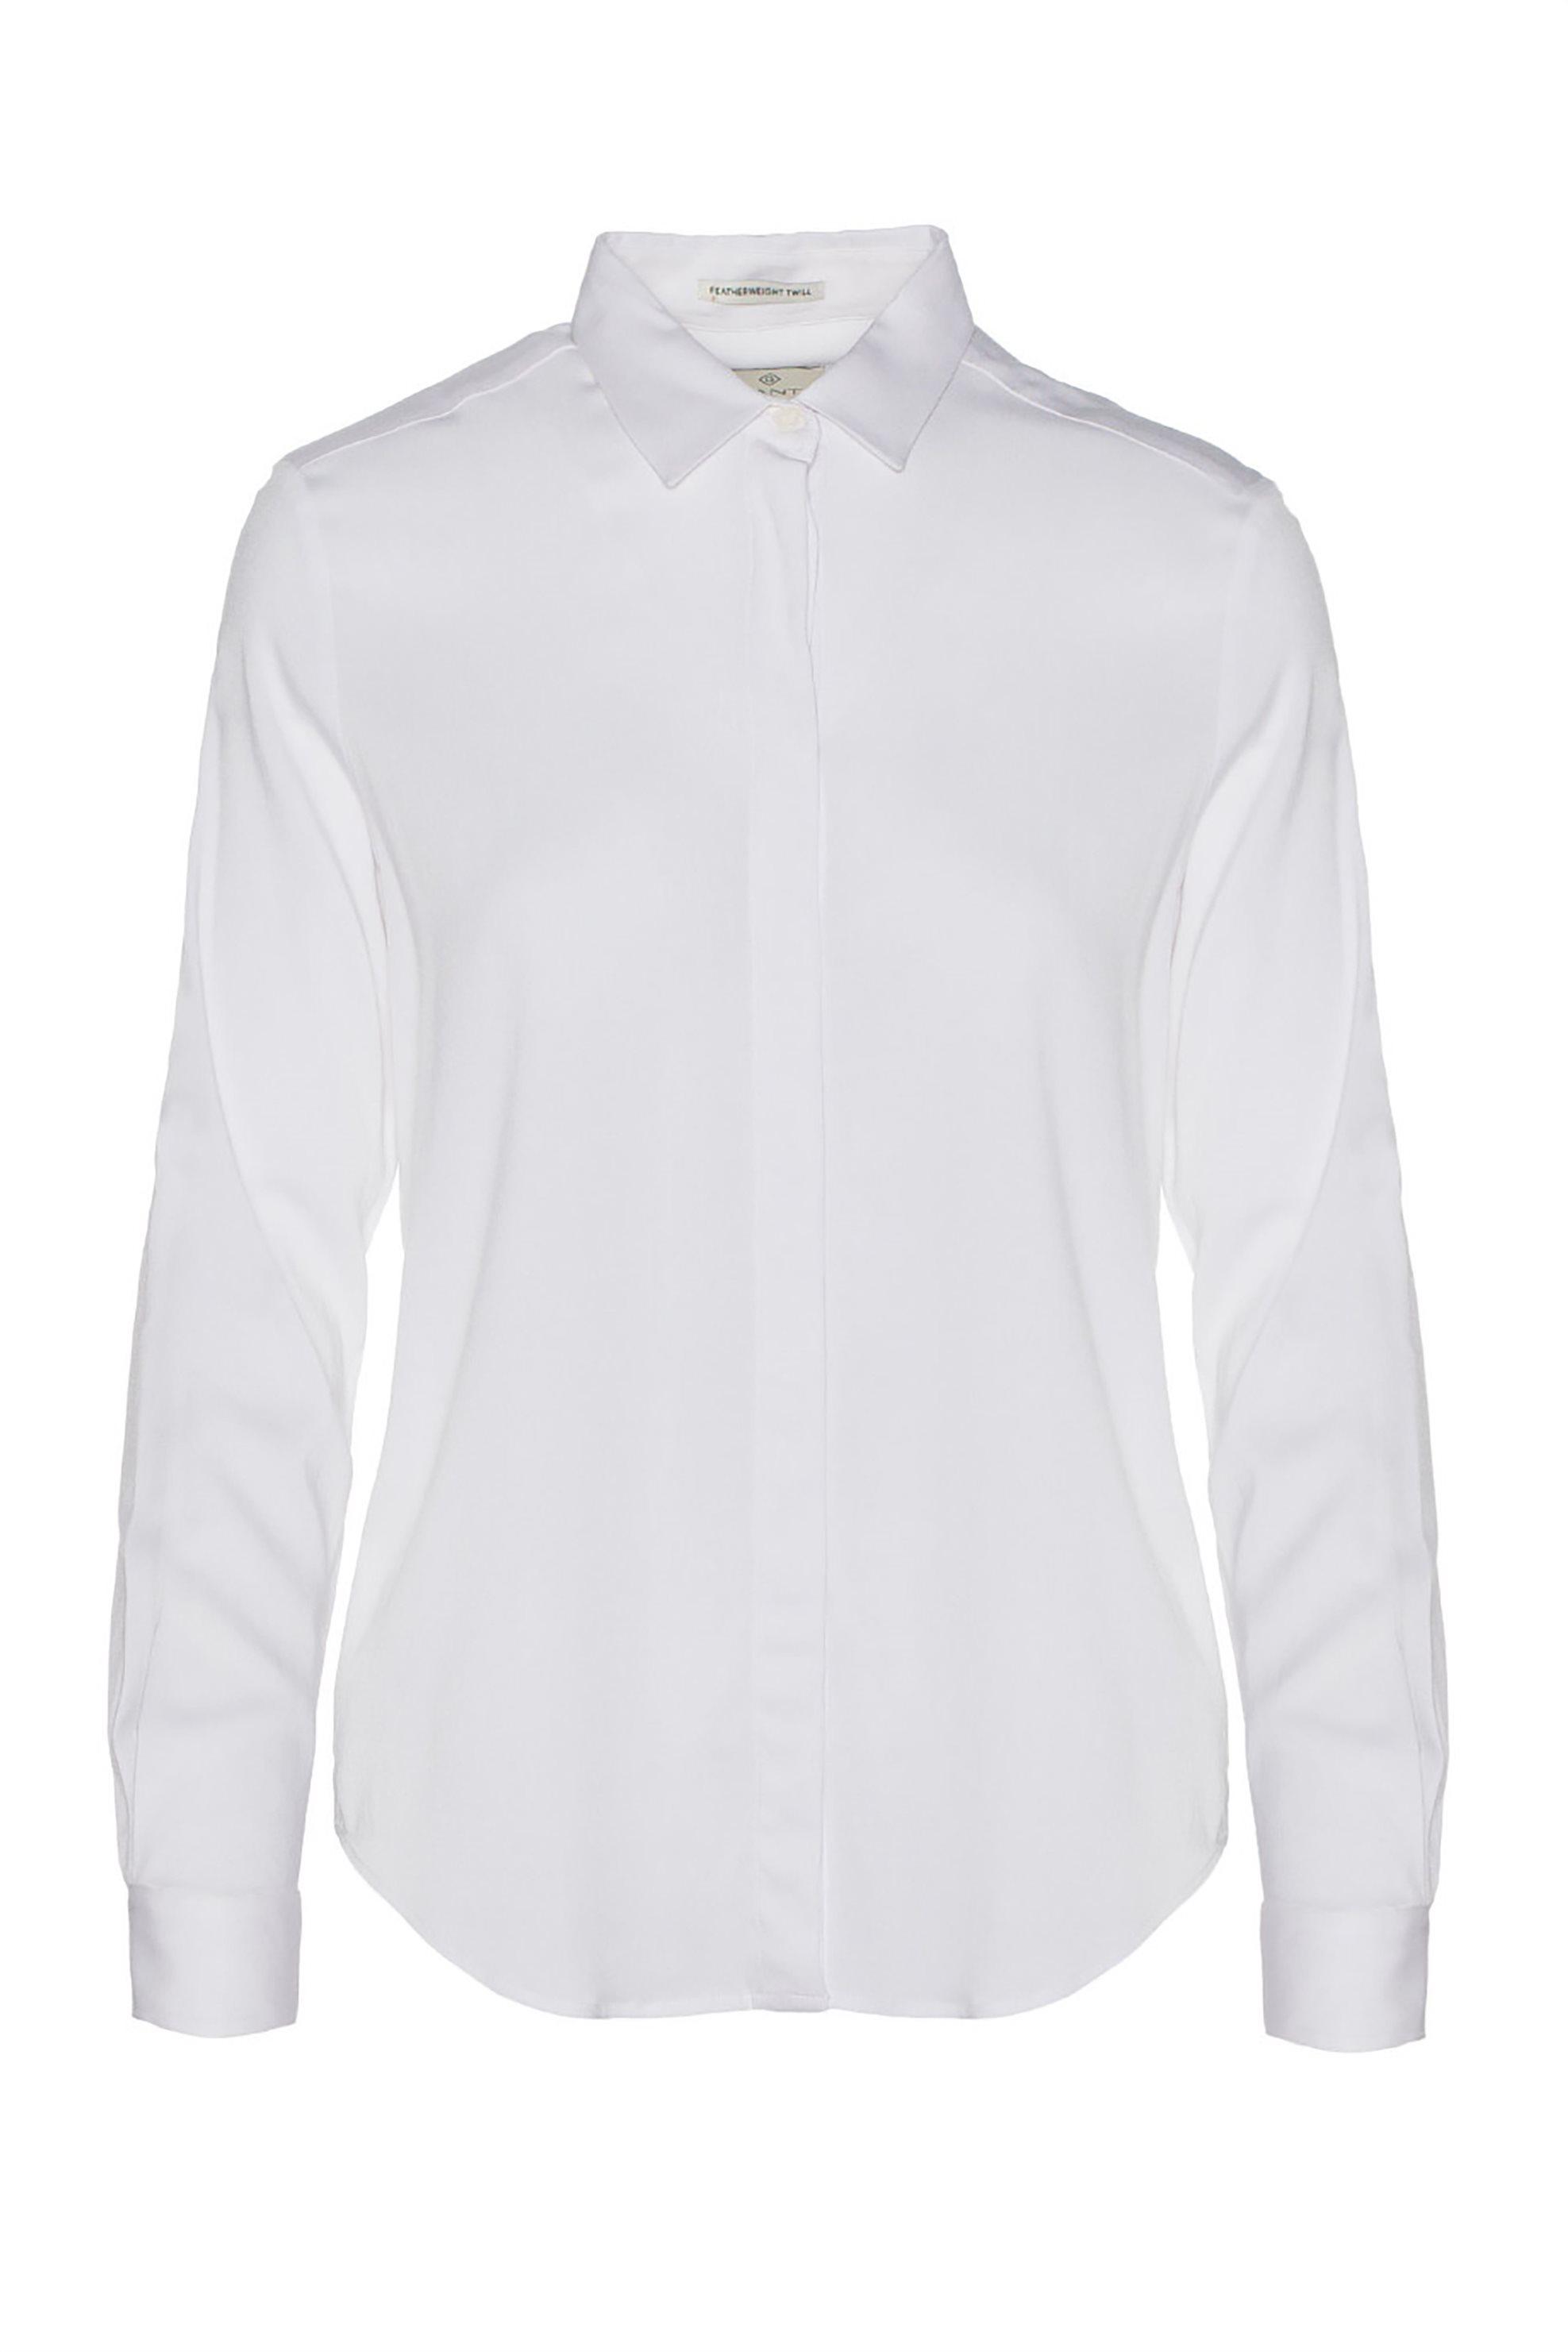 dac0f93ceb80 Γυναικεία   Ρούχα   Πουκάμισα   Πουκάμισο άσπρο μαύρο γυναικείο ...